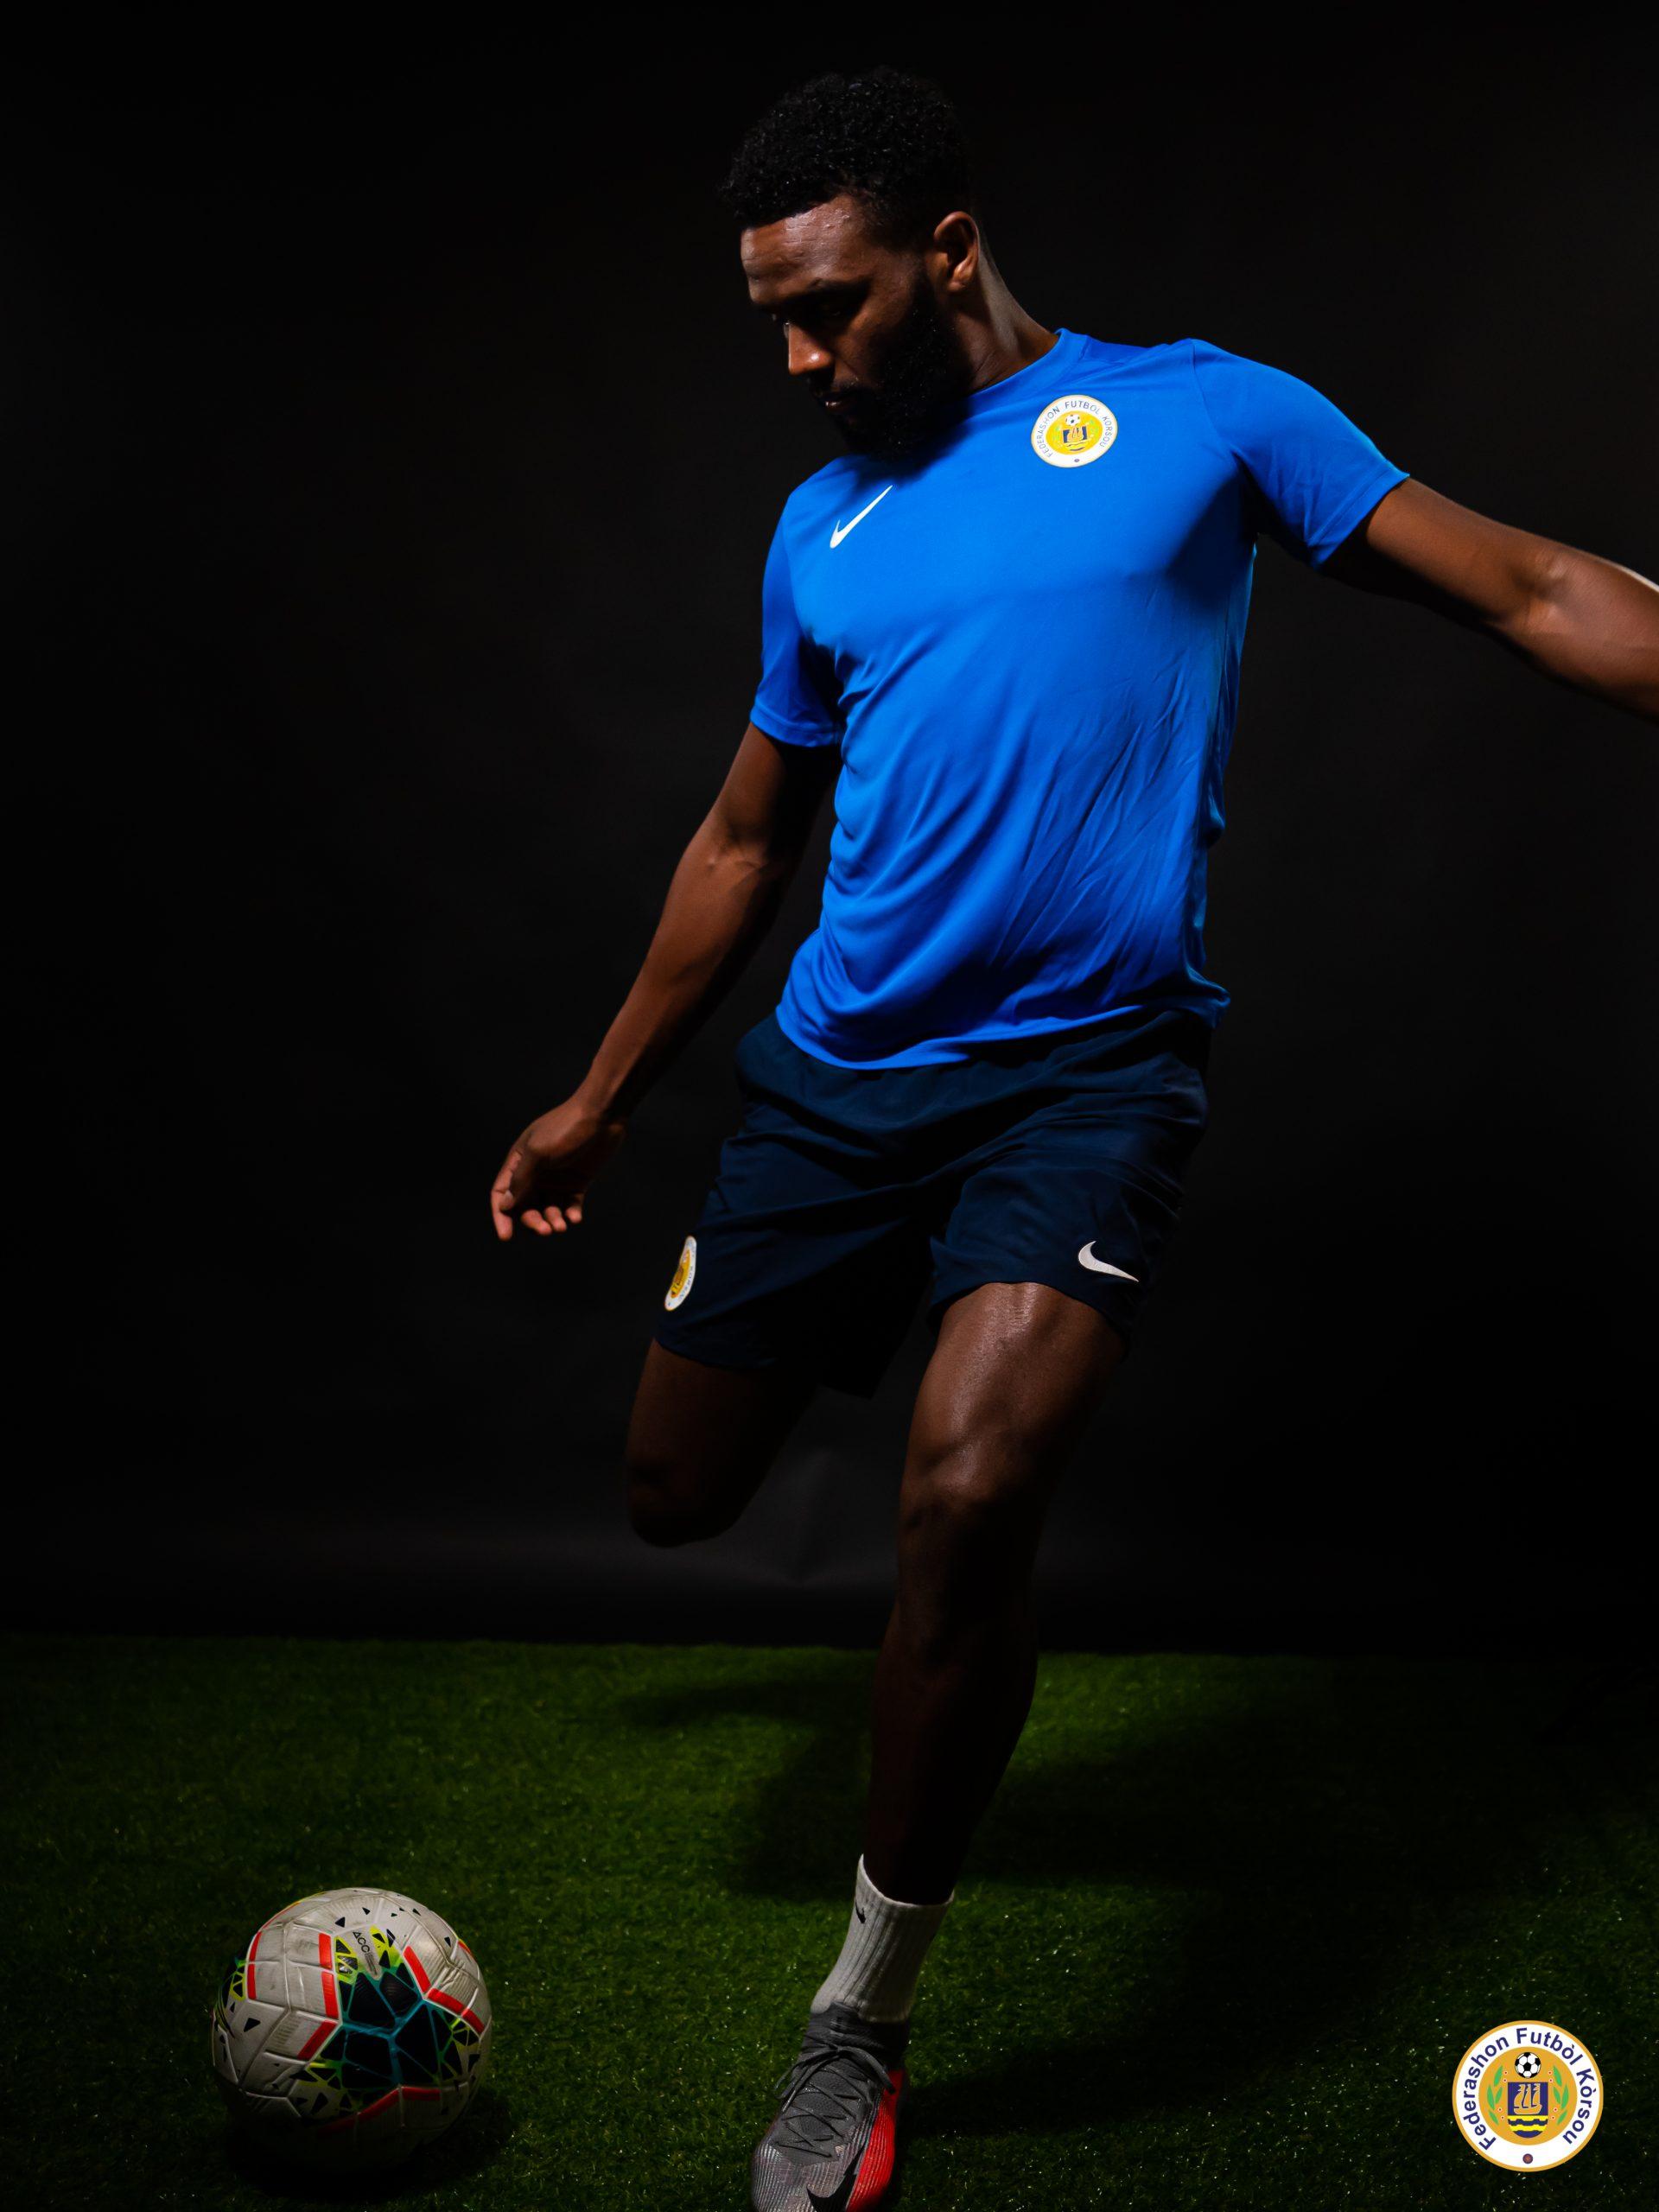 A full body shot from Cuco Martina, kicking a football.